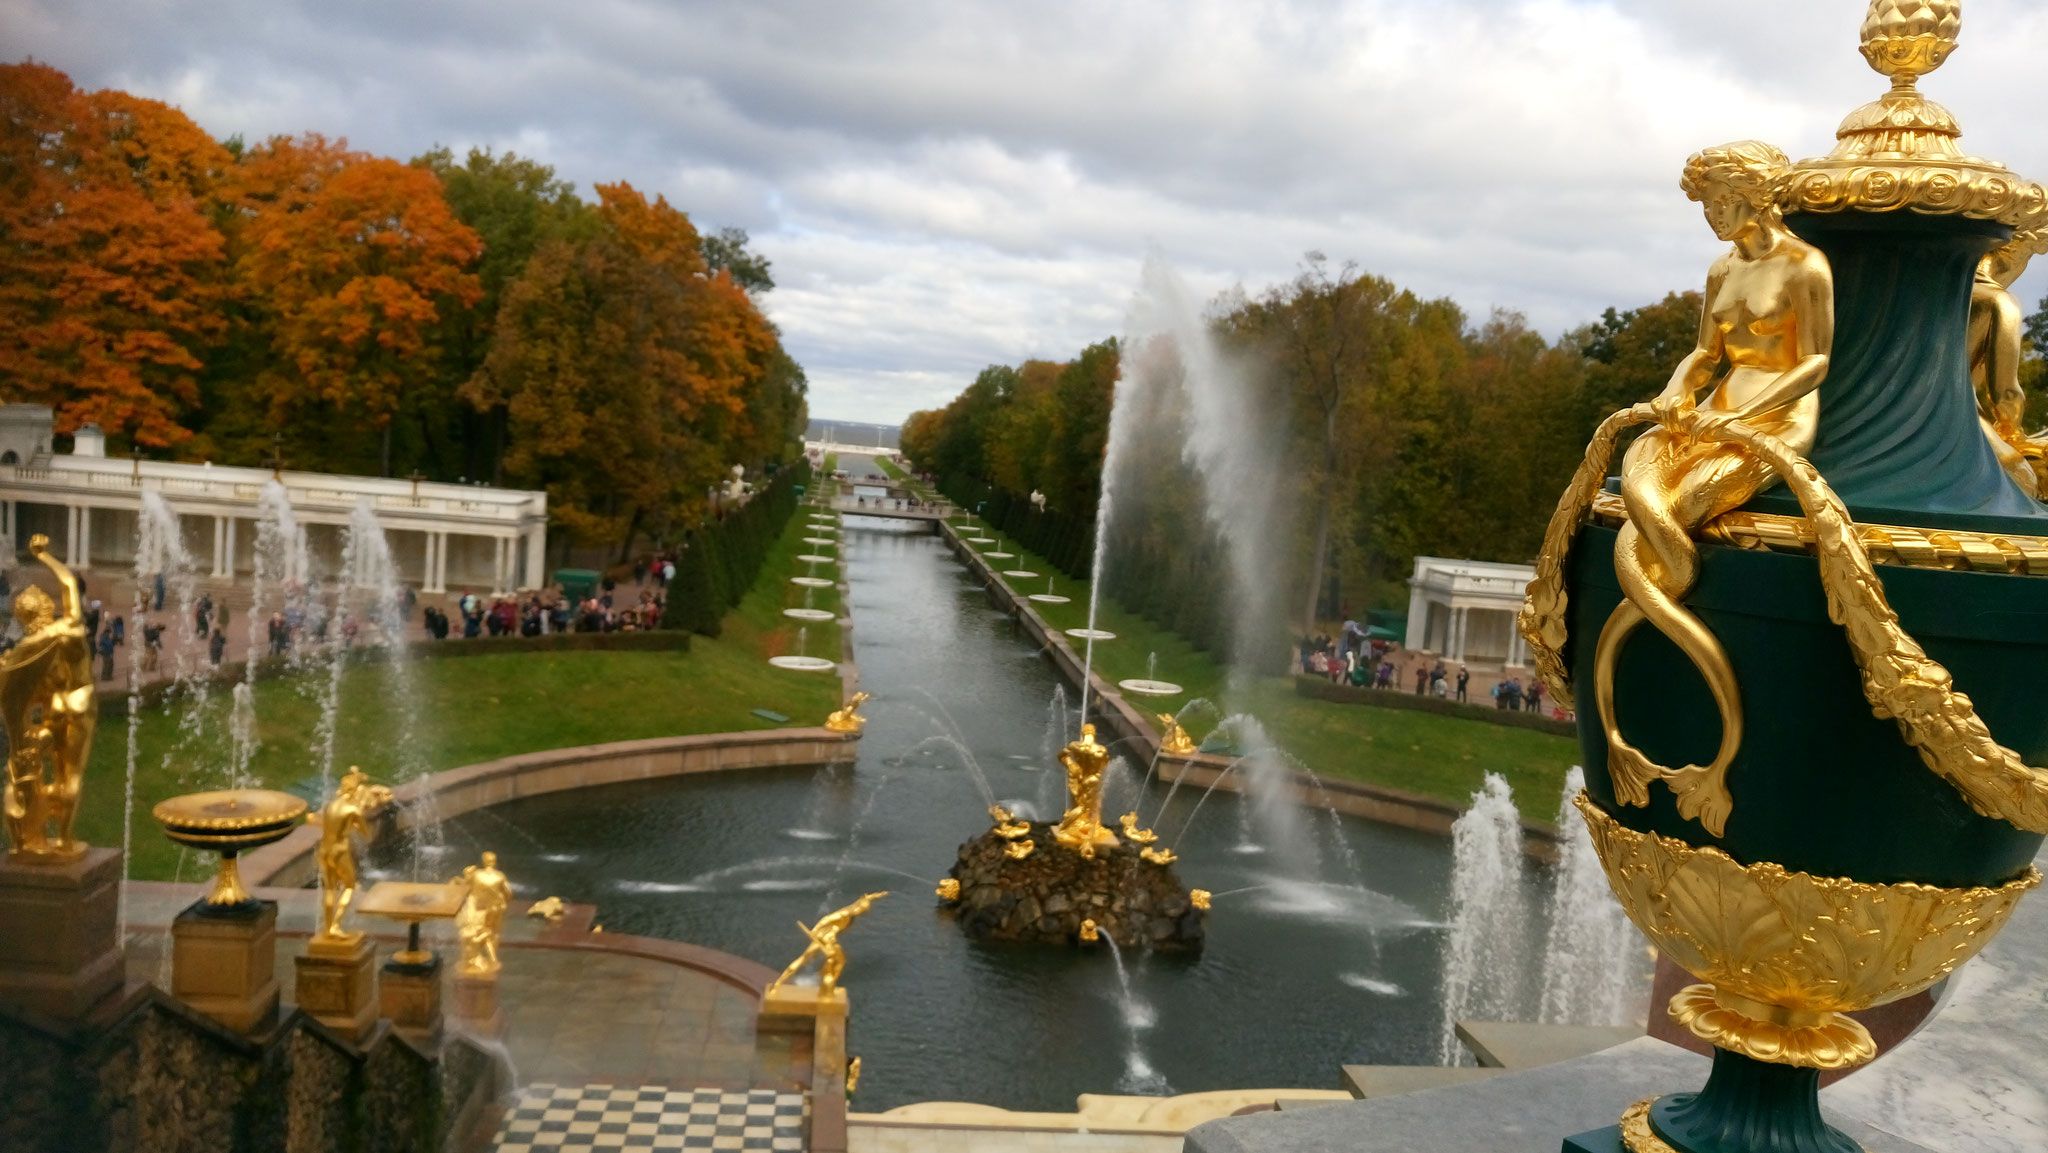 In der Zarenresidenz Peterhof